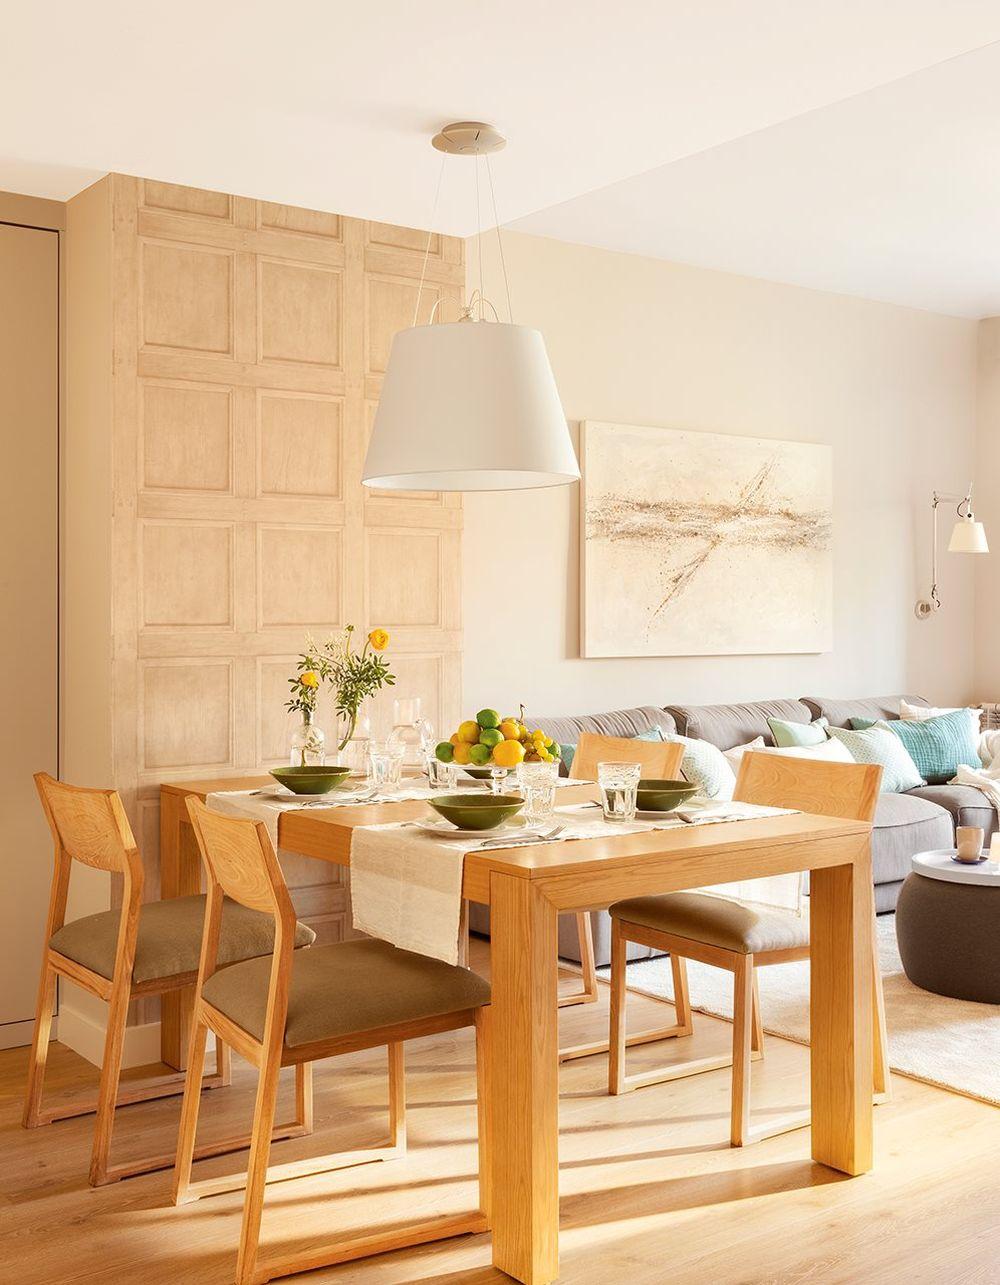 adelaparvu.com despre apartament 75 mp in tonuri deschise, designer Pia Capdevila, Foto Fernando Bedon, ElMueble (3)